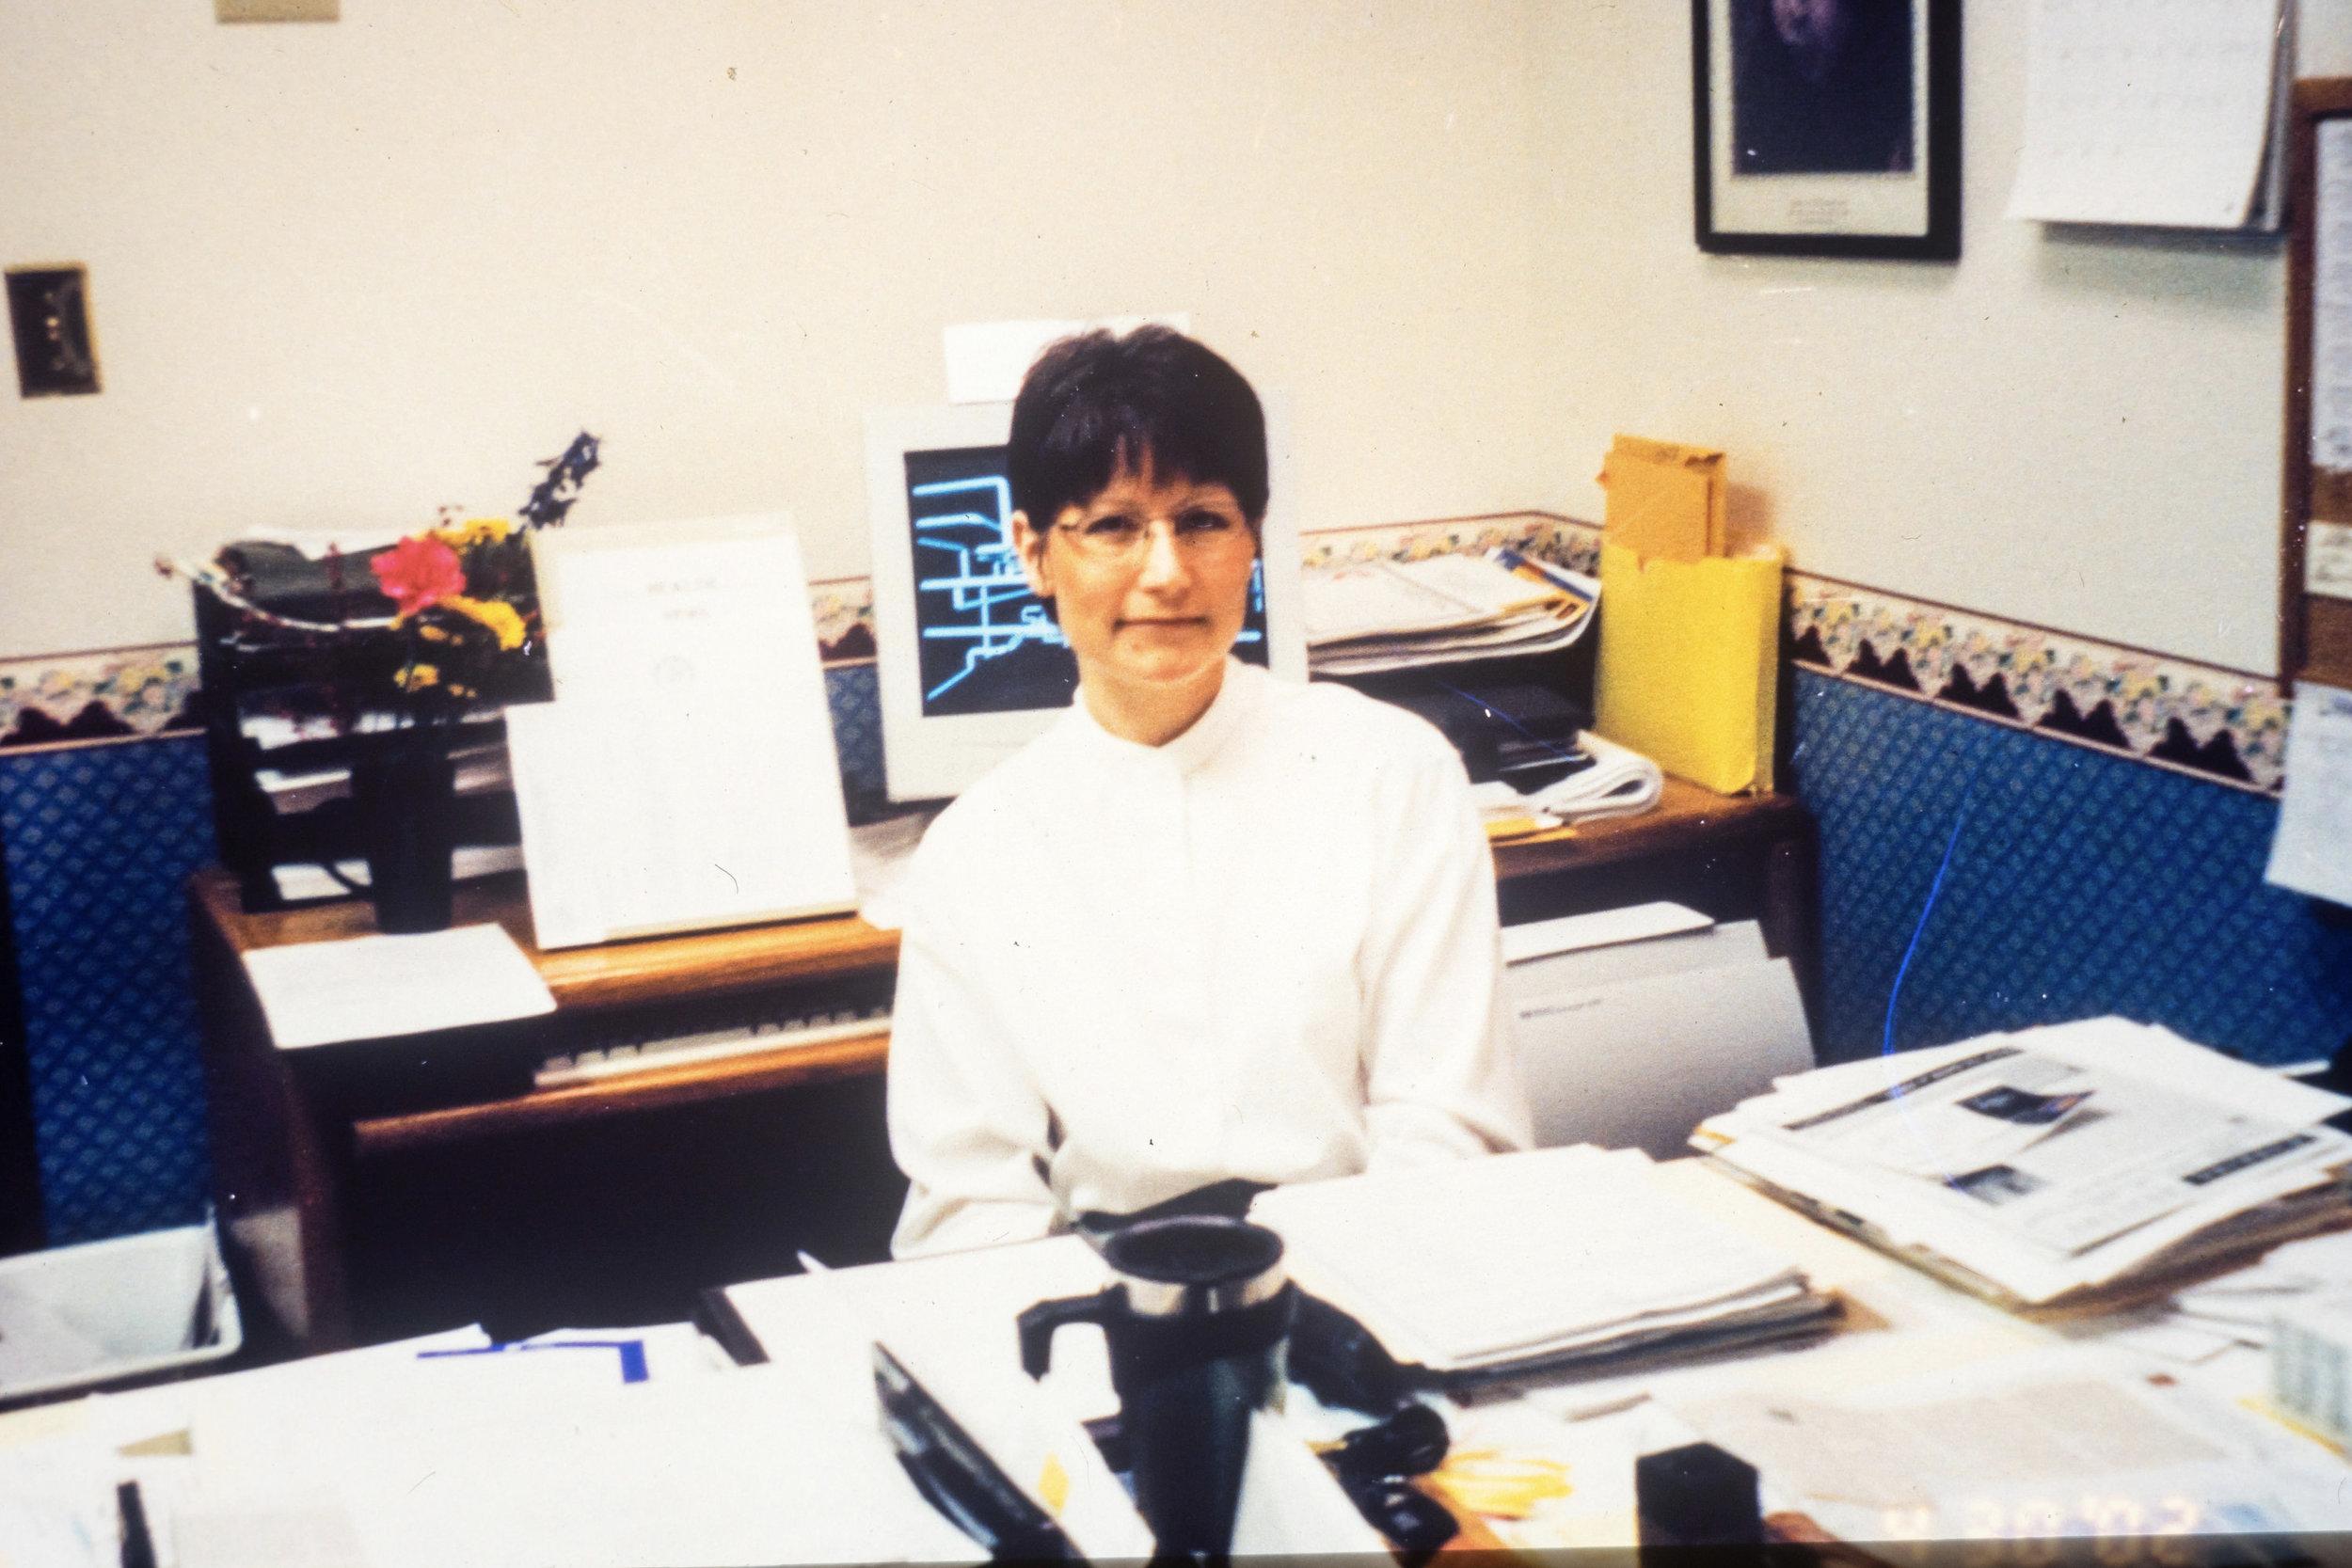 Former Executive Director Karlen Jones